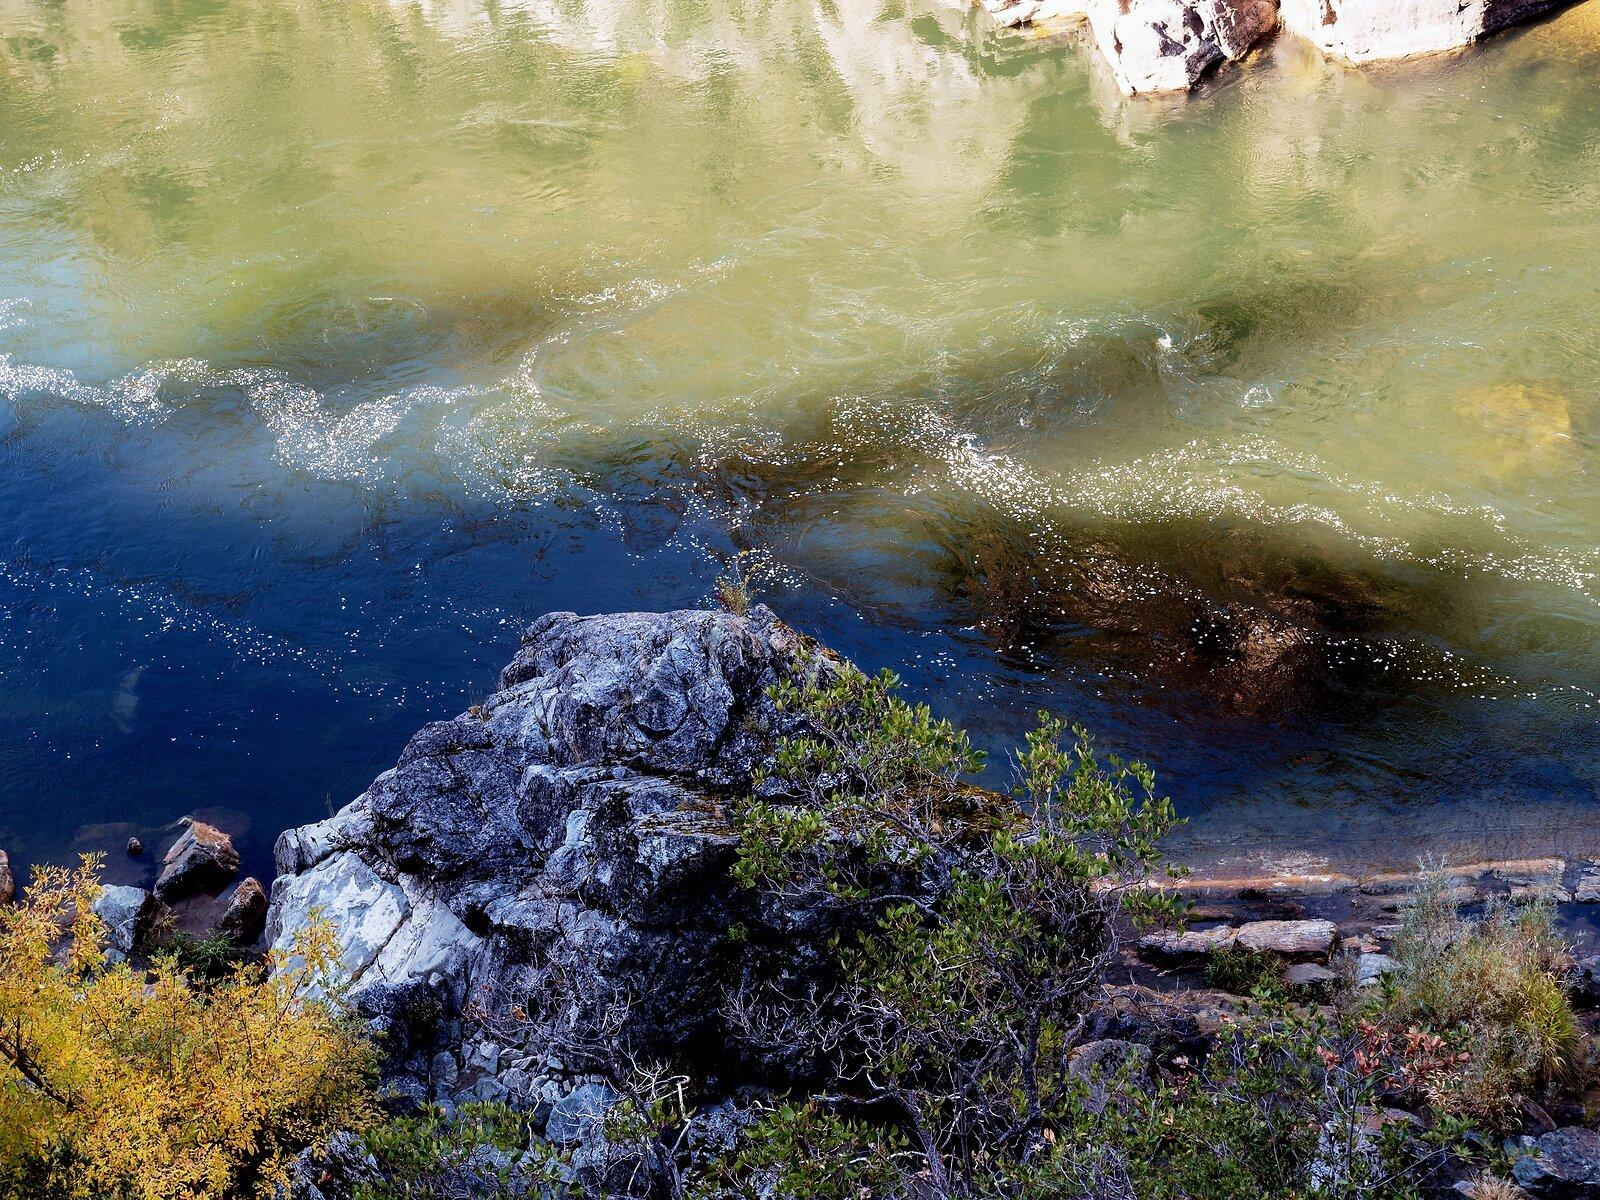 GX8_Oct19_Rogue_River#17(Rocks+River).jpg